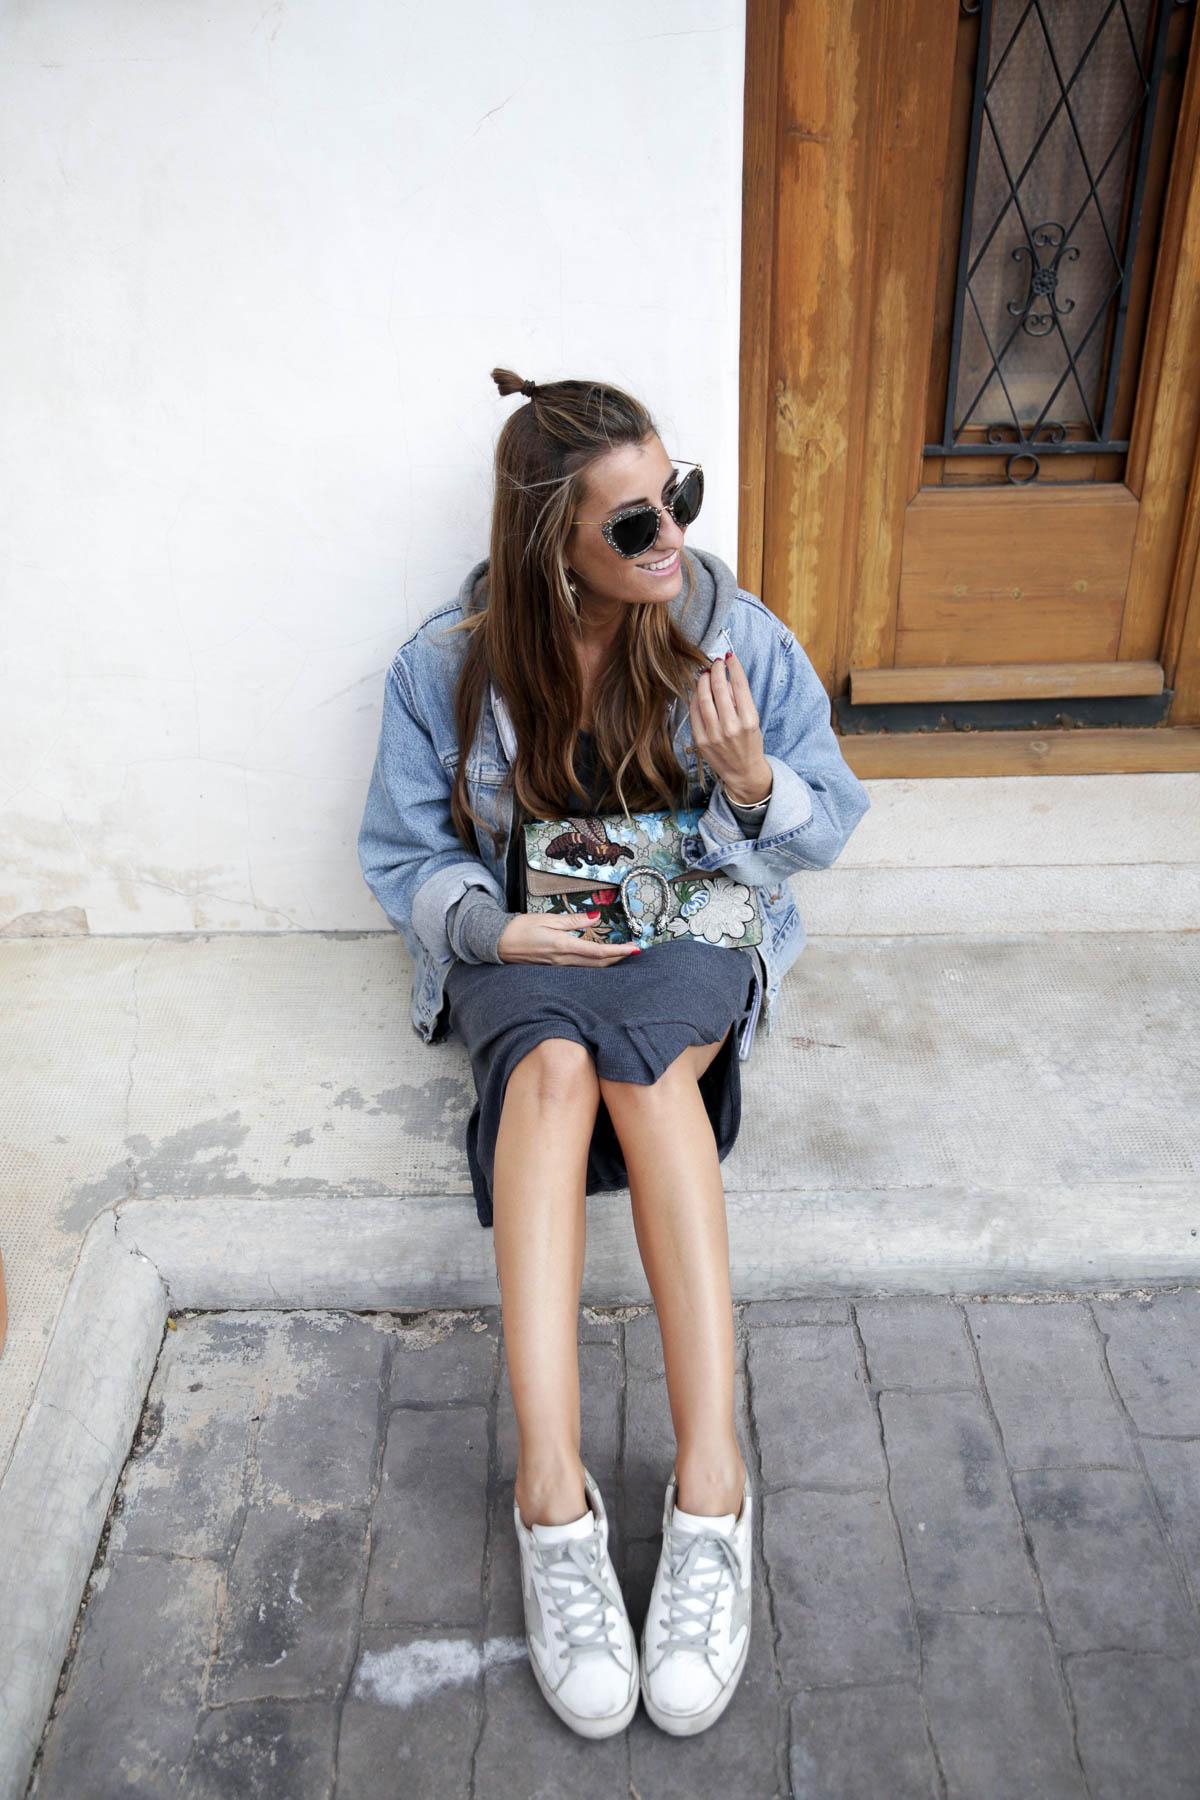 black-friday-a-bicyclette-sweatshirt-hoodie-all-star-leather-piel-cuero-celine-bag-bolso-mini-skirt-falda-streetstyle-look-bartabac-outfit-moda-blogger-27